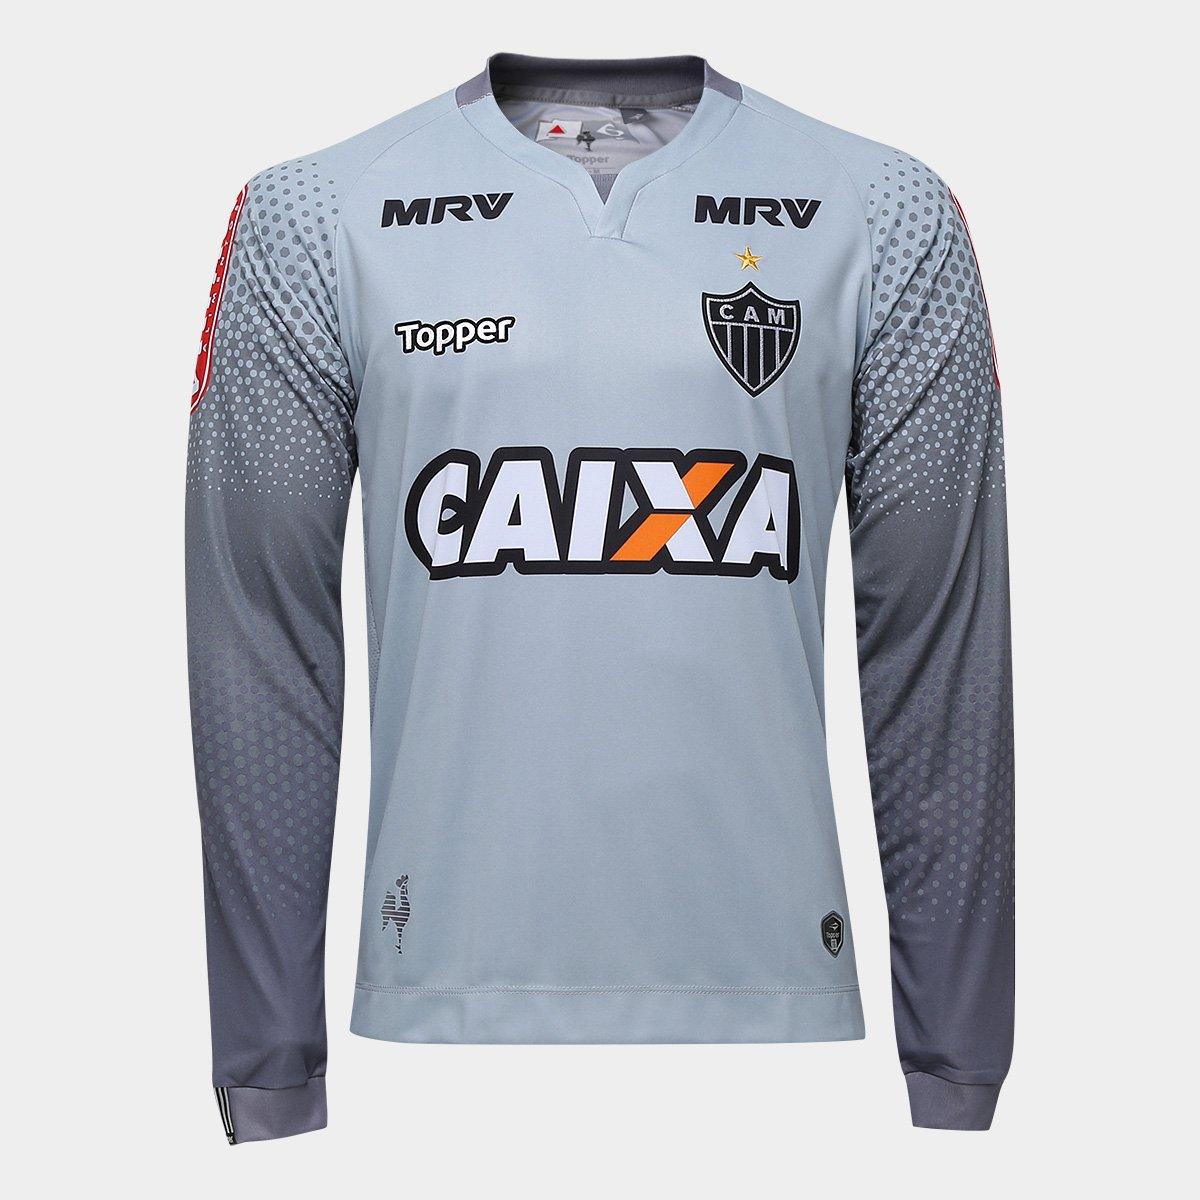 Camisa Atlético-MG Goleiro I 17 18 Manga Longa nº 1 Topper Masculina -  Compre Agora  b11a9907a23b4